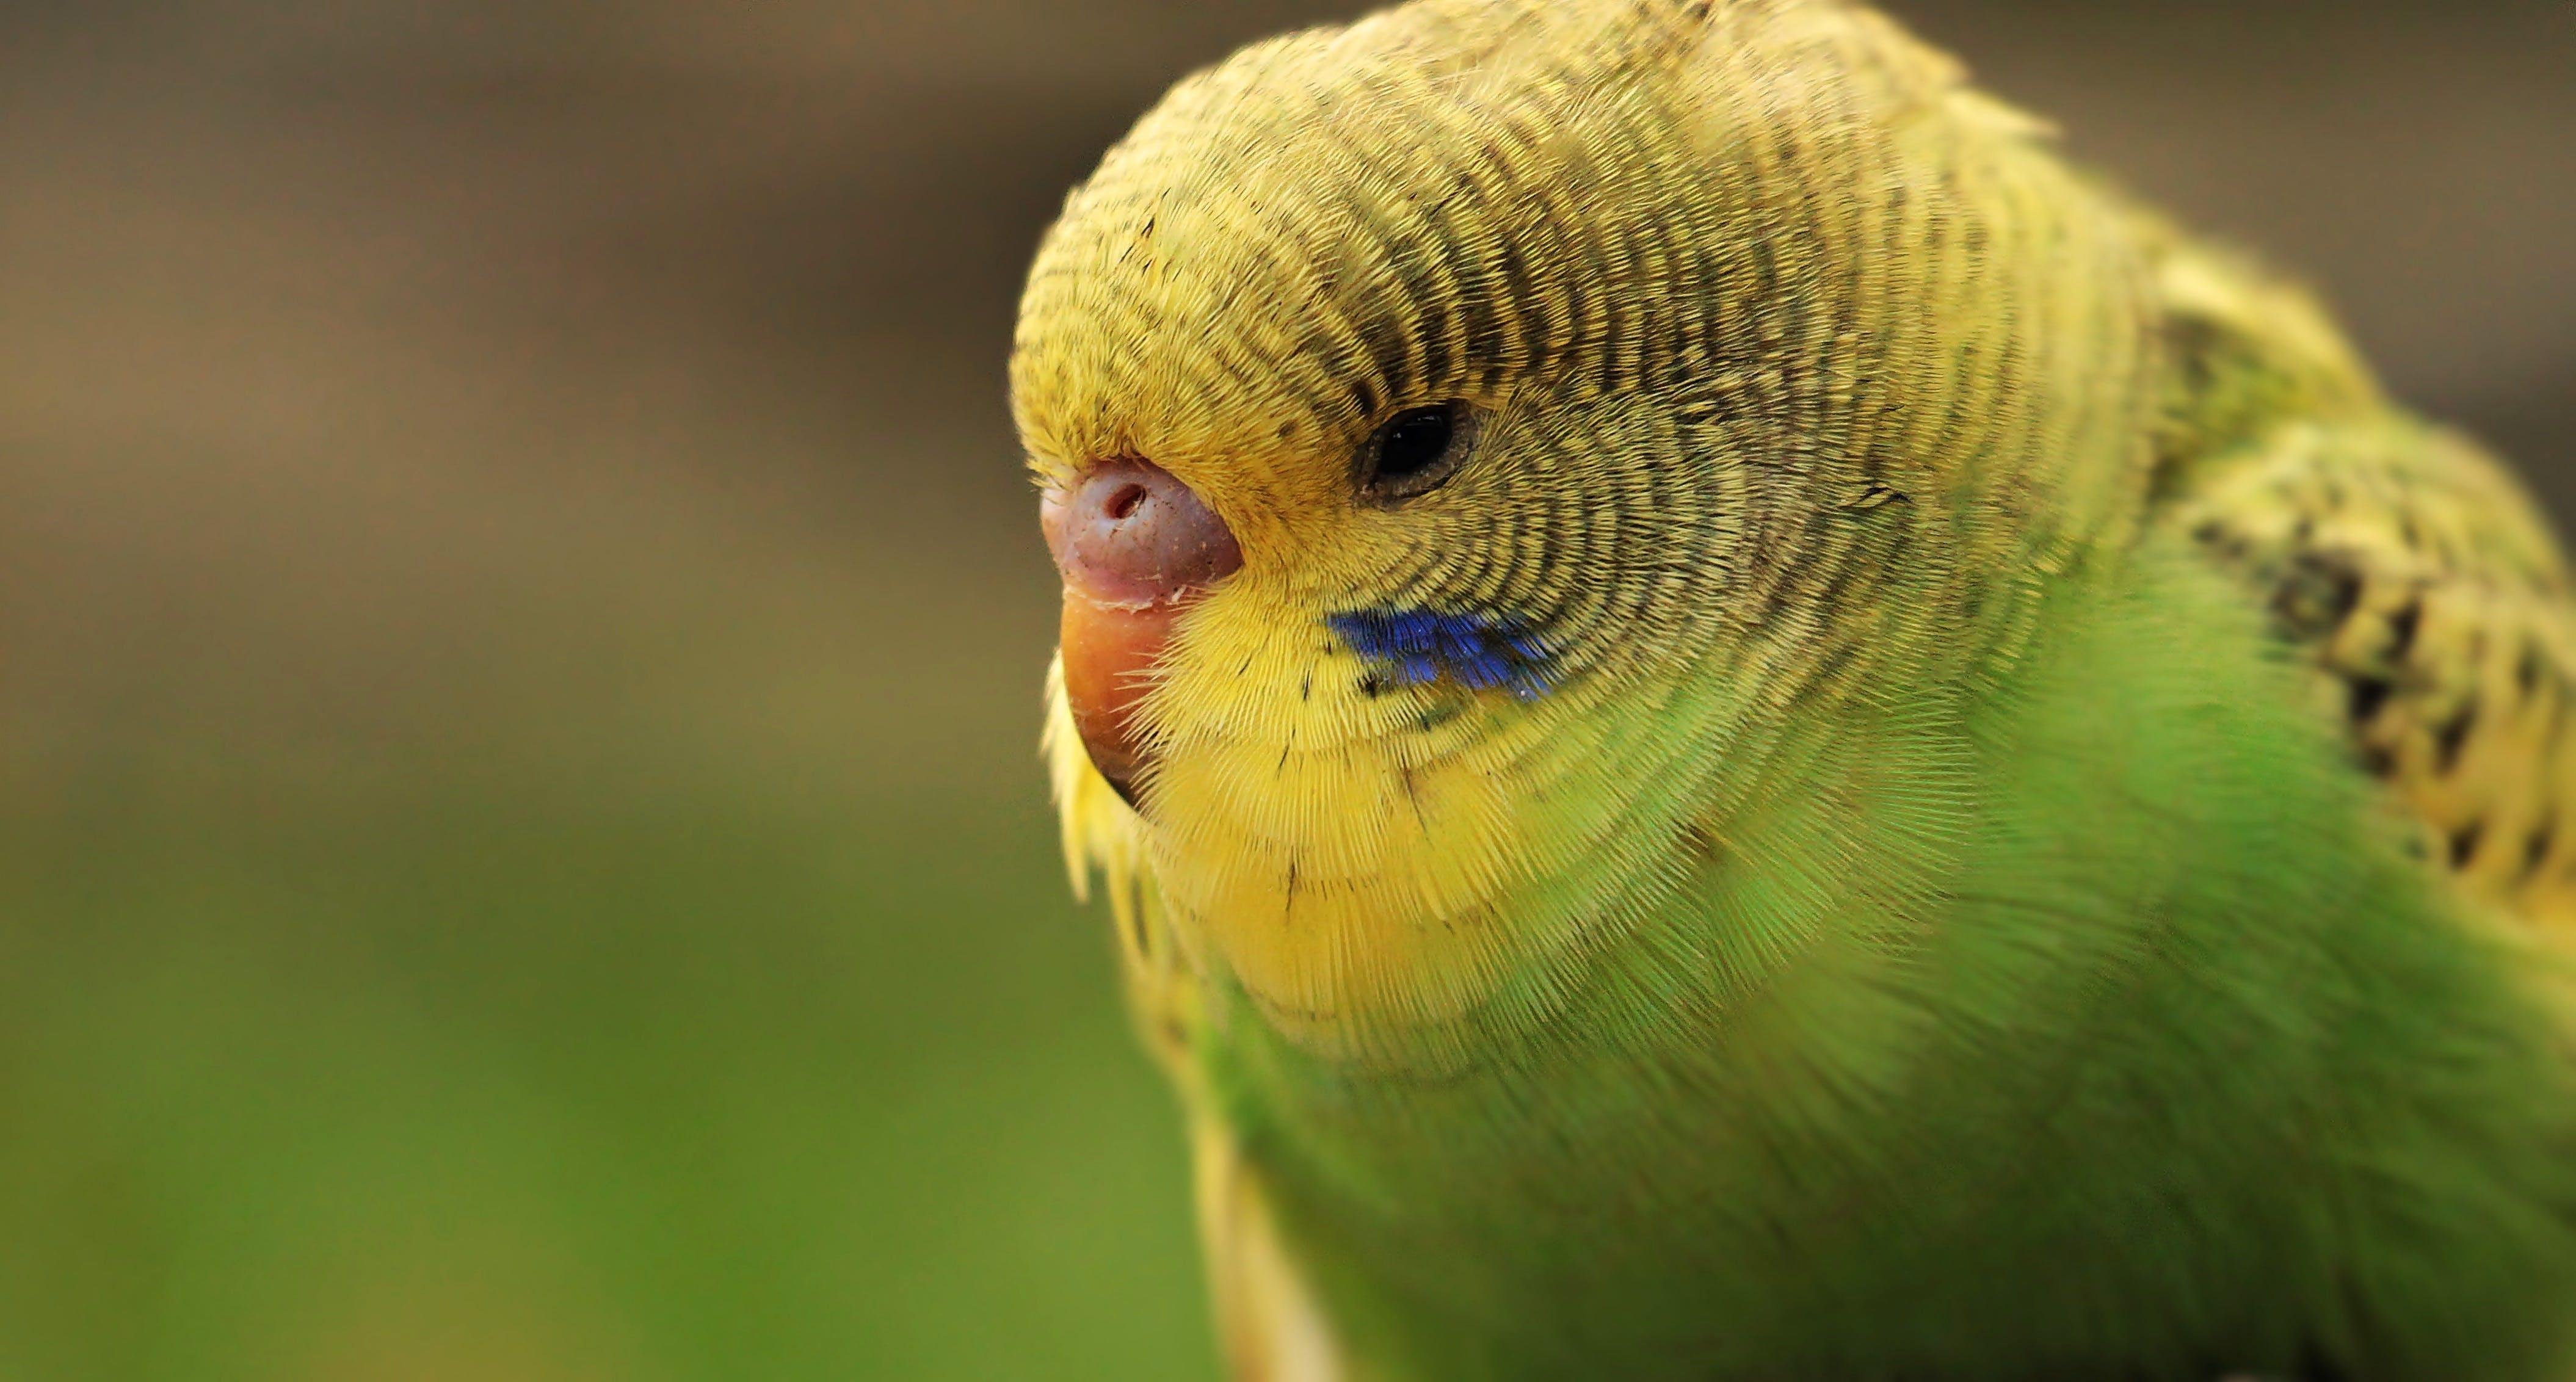 Free stock photo of bird, yellow, animal, cute